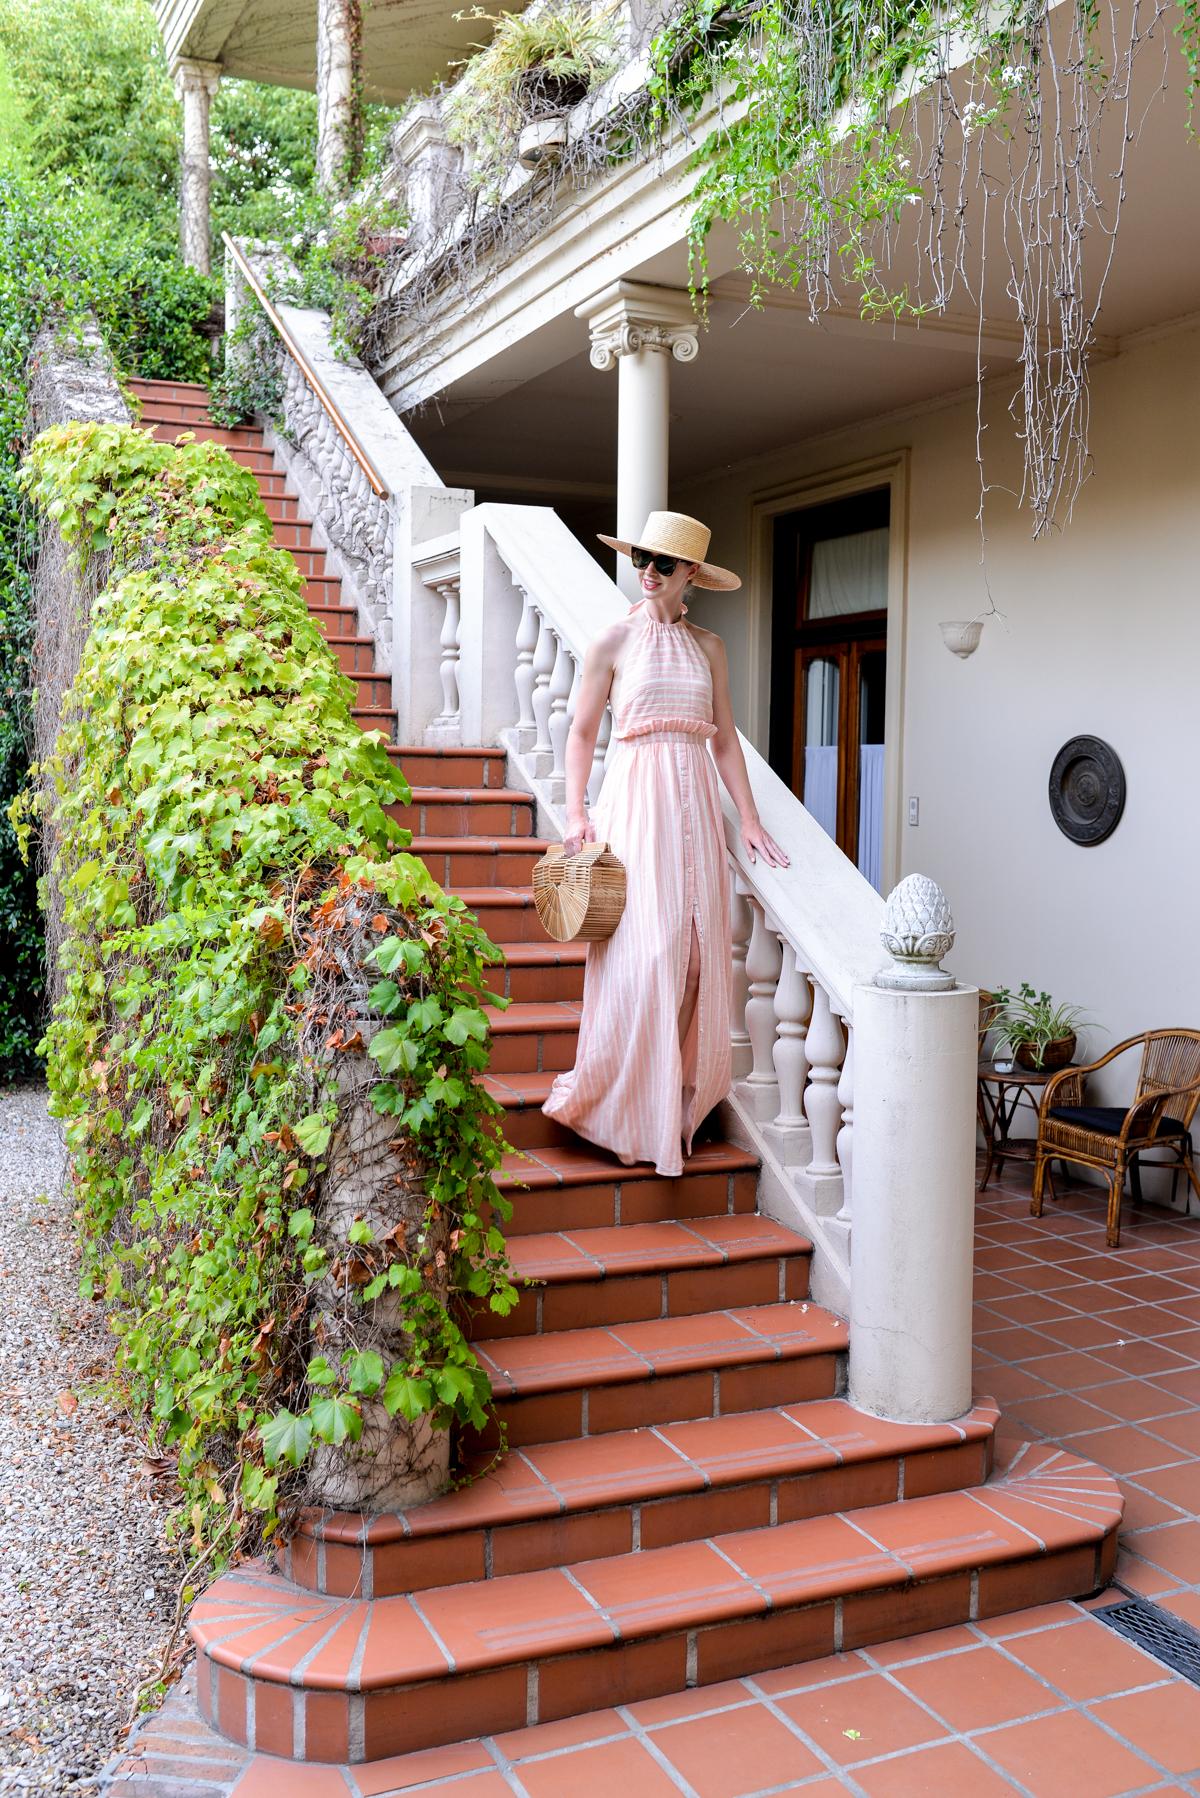 Stacie-Flinner-San-Isidro-Hotel-Del-Casco-24